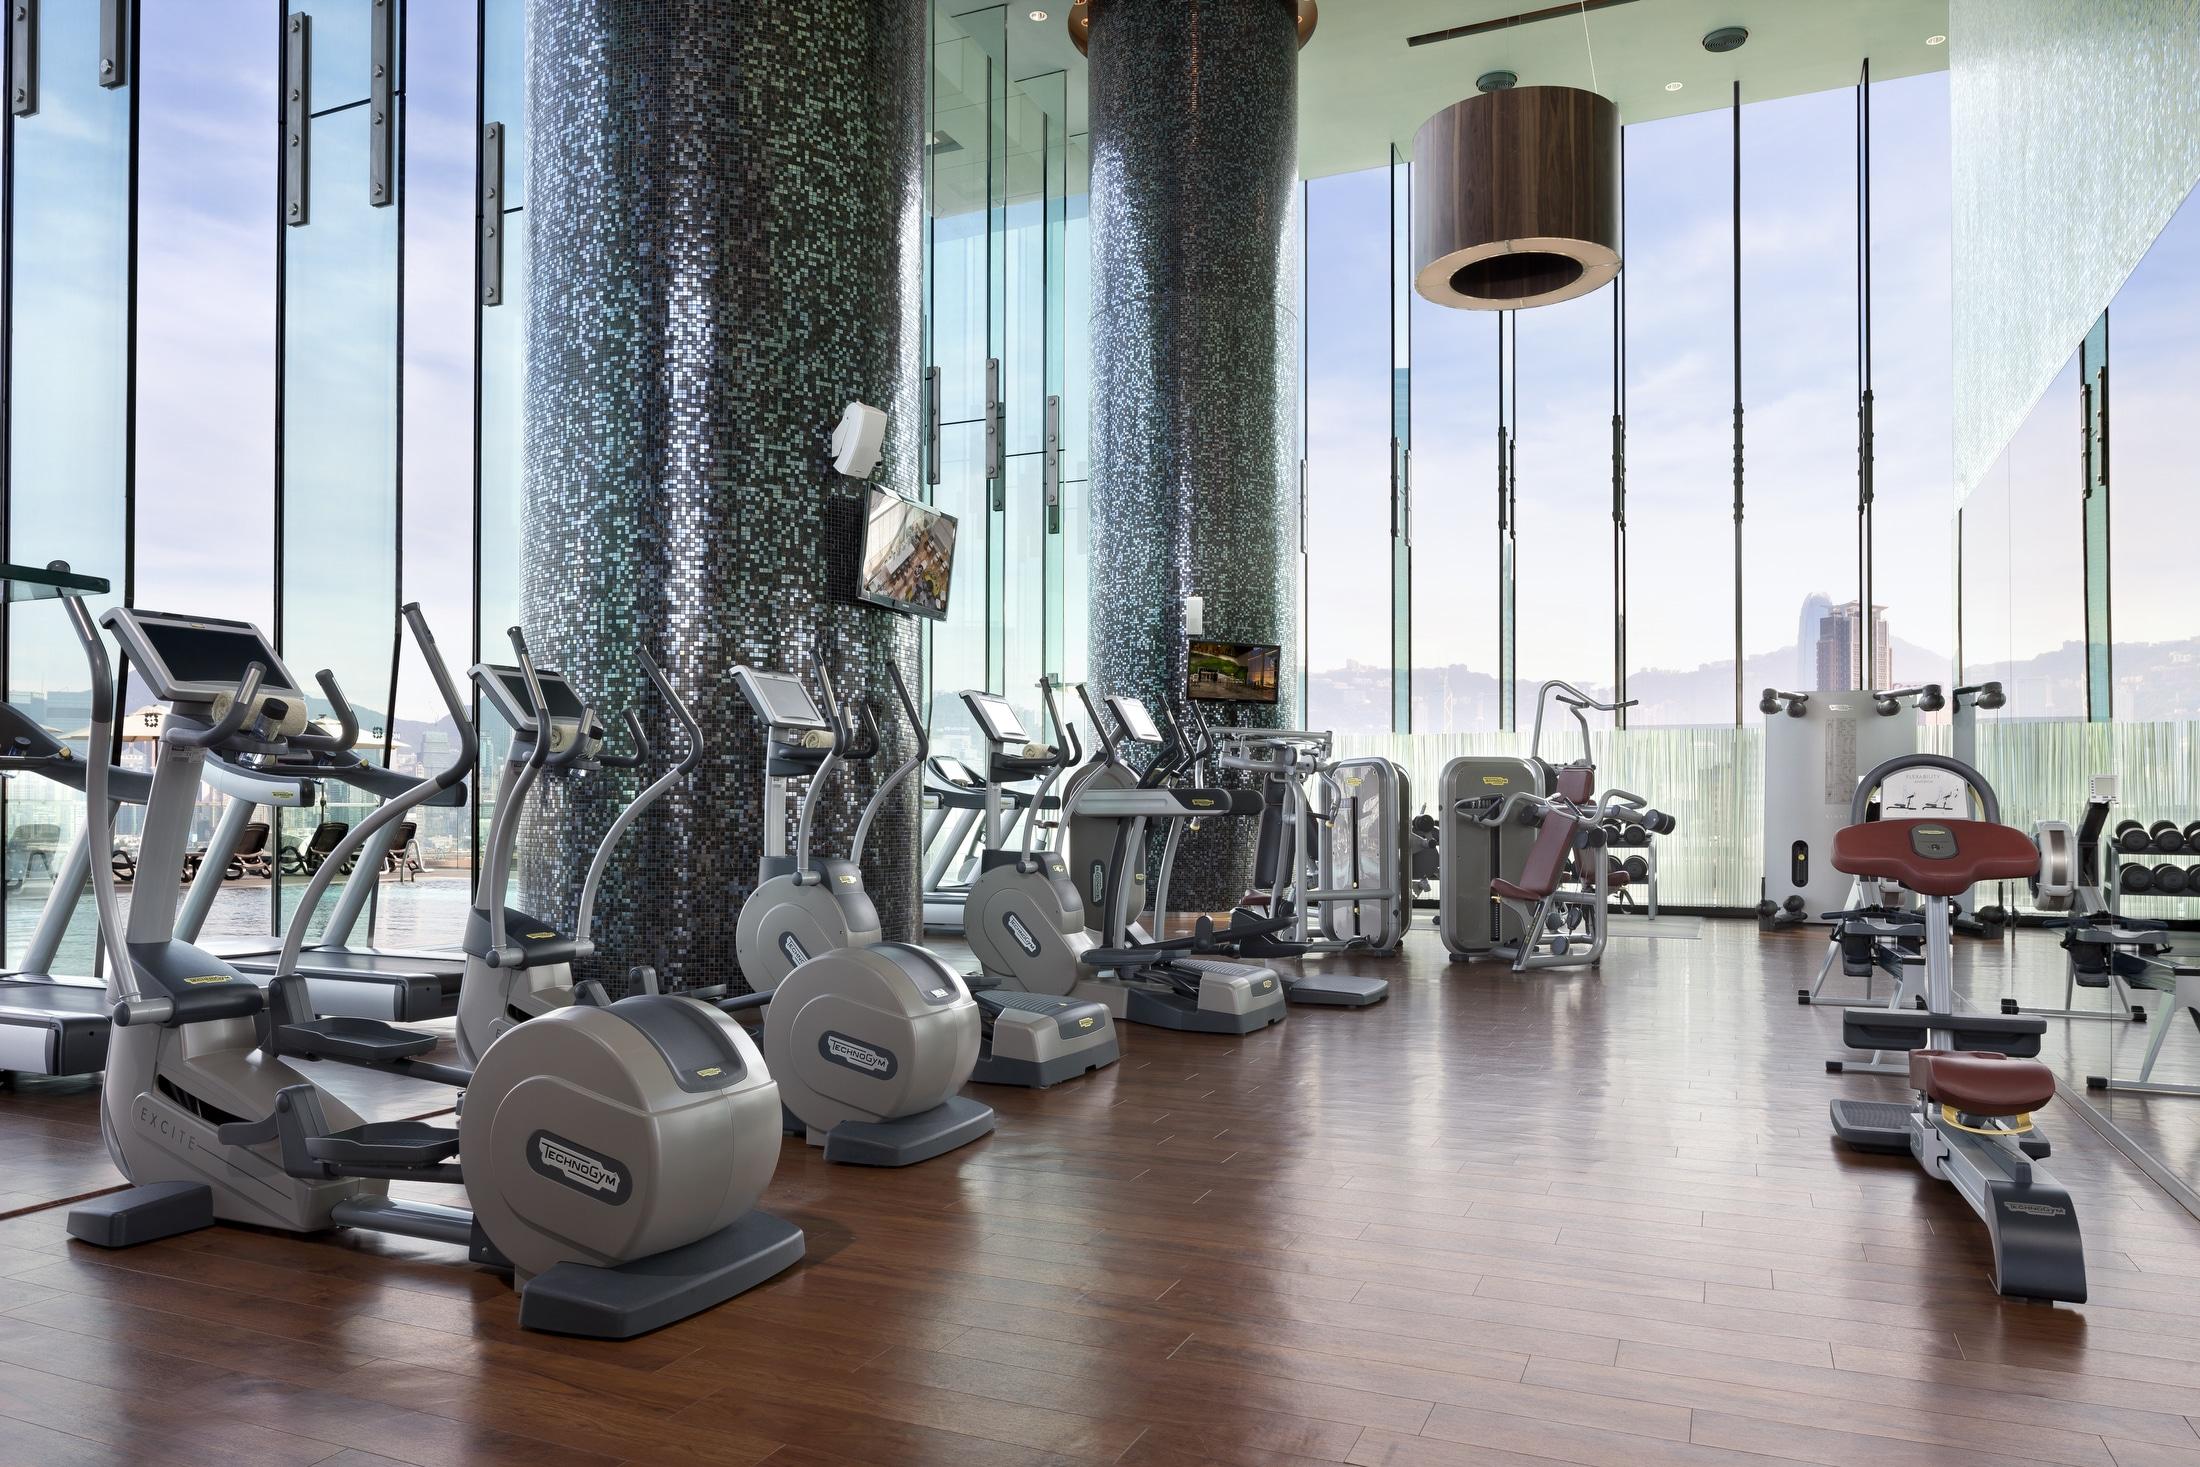 Cardo equipment inside the gym looks over the harbour through floor to ceiling windows.